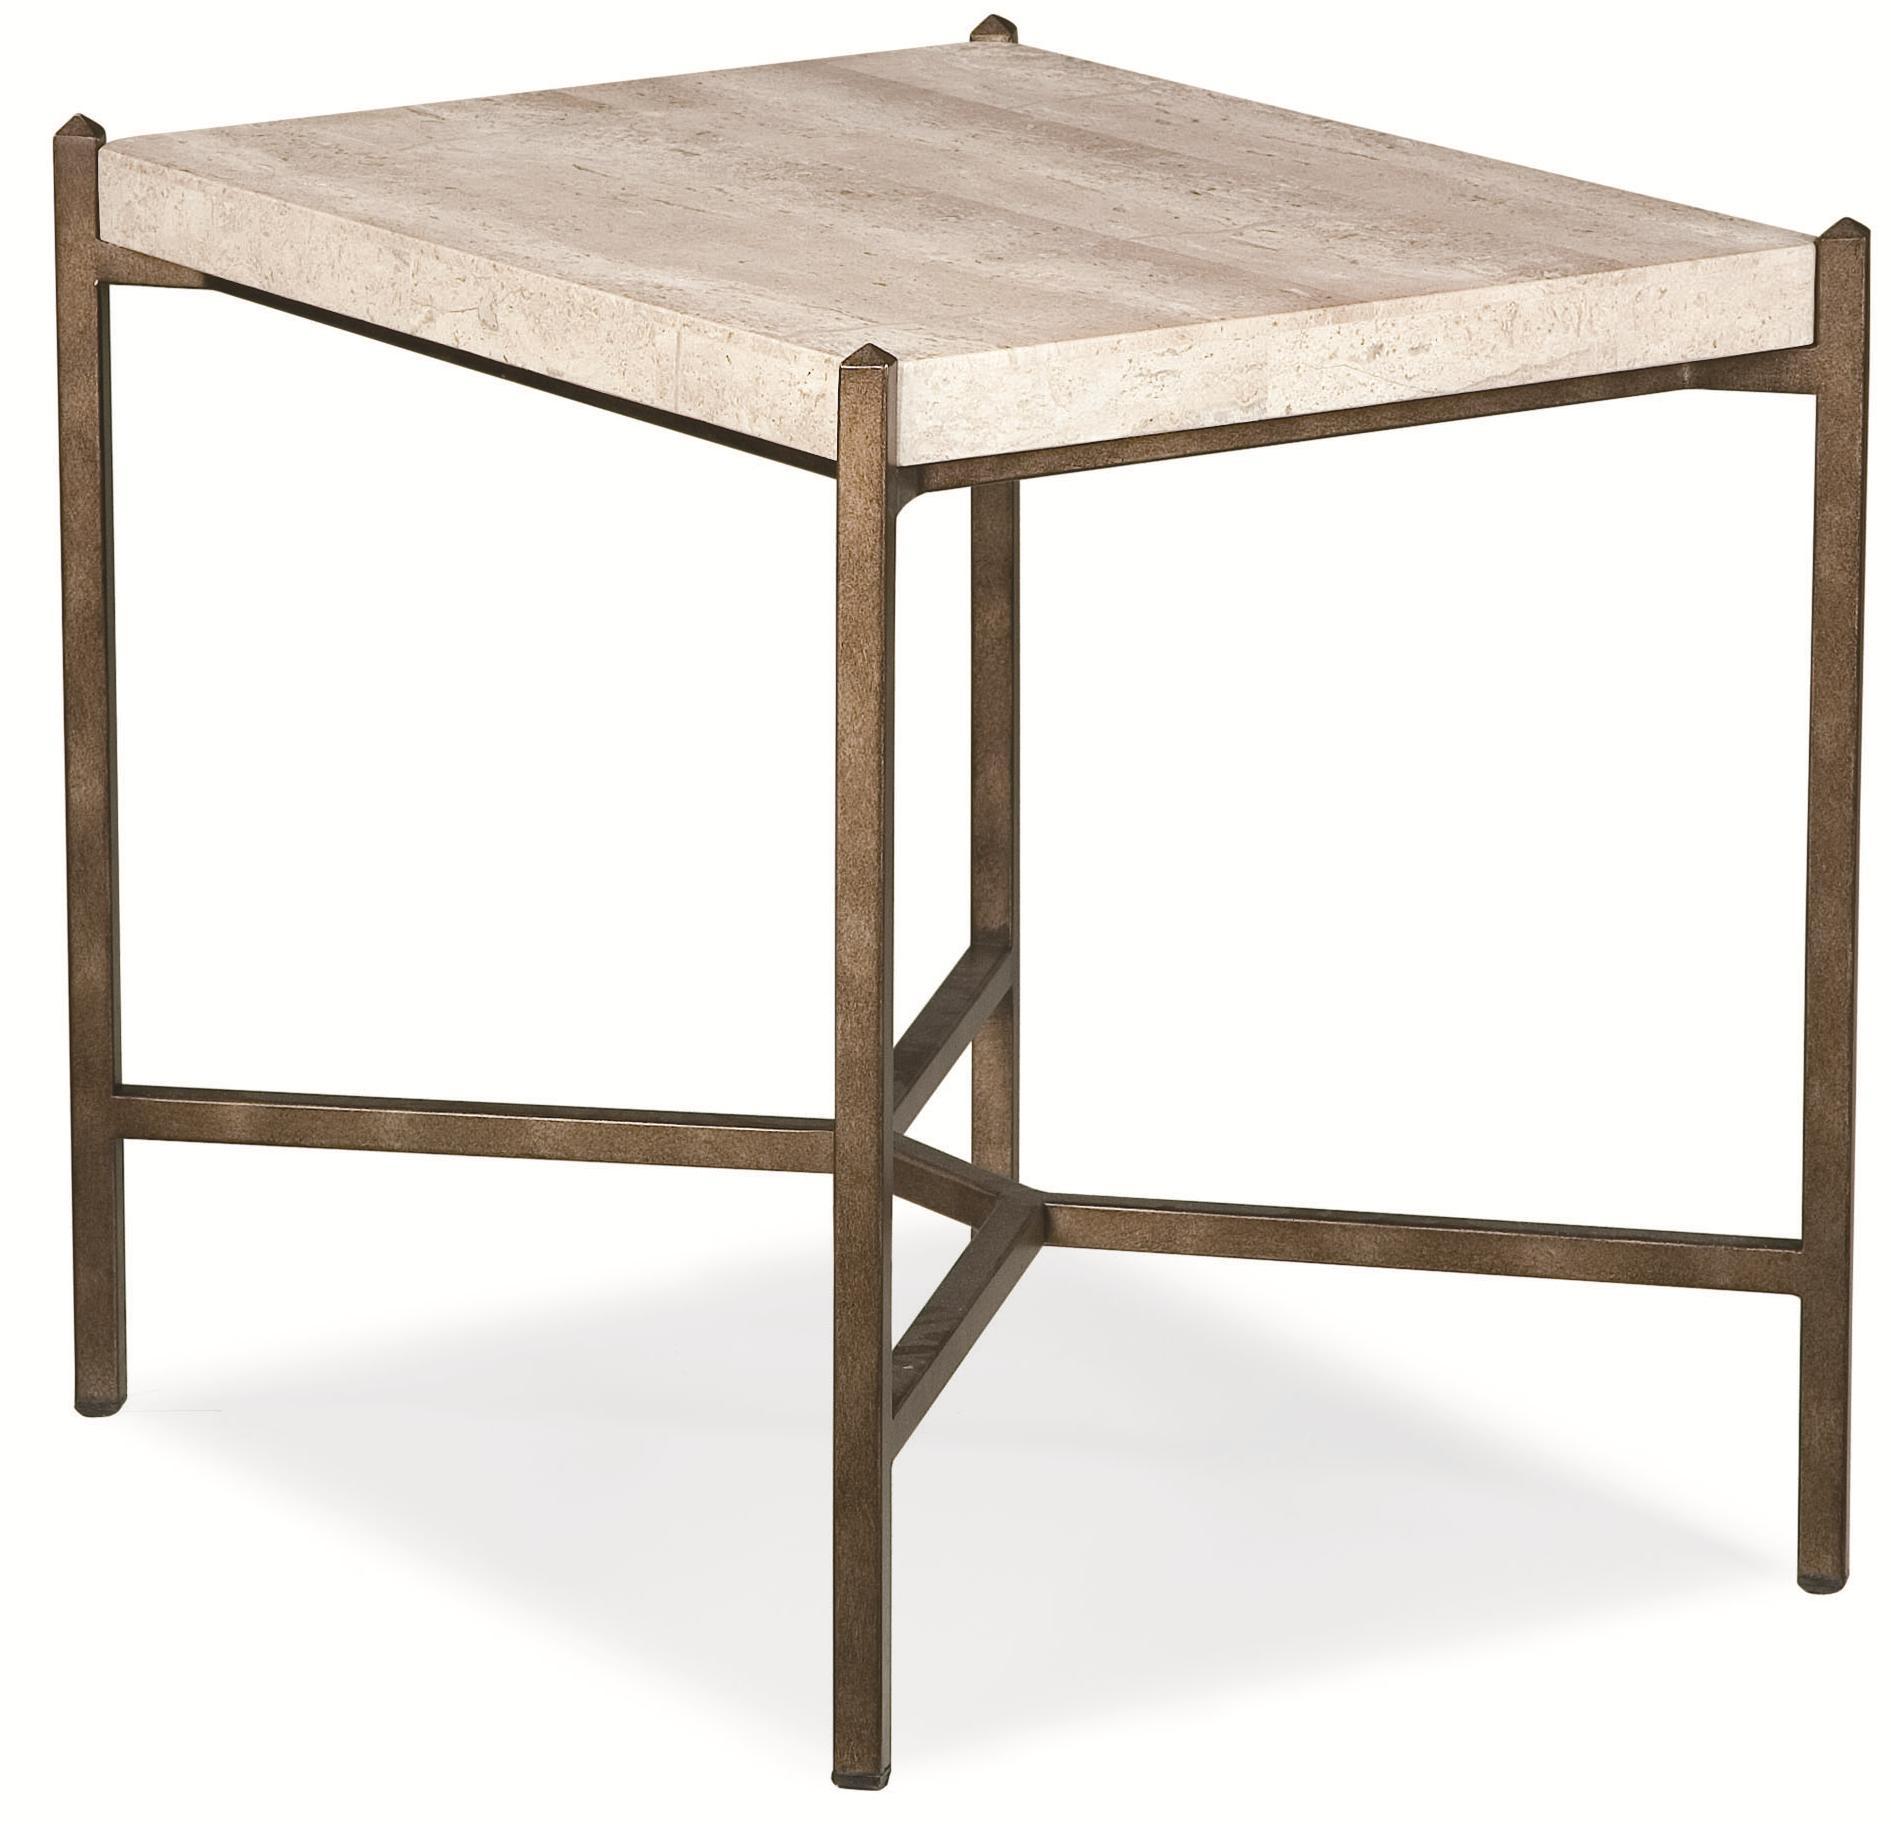 Thomasville® Cachet End Table W/ Travertine Stone Top